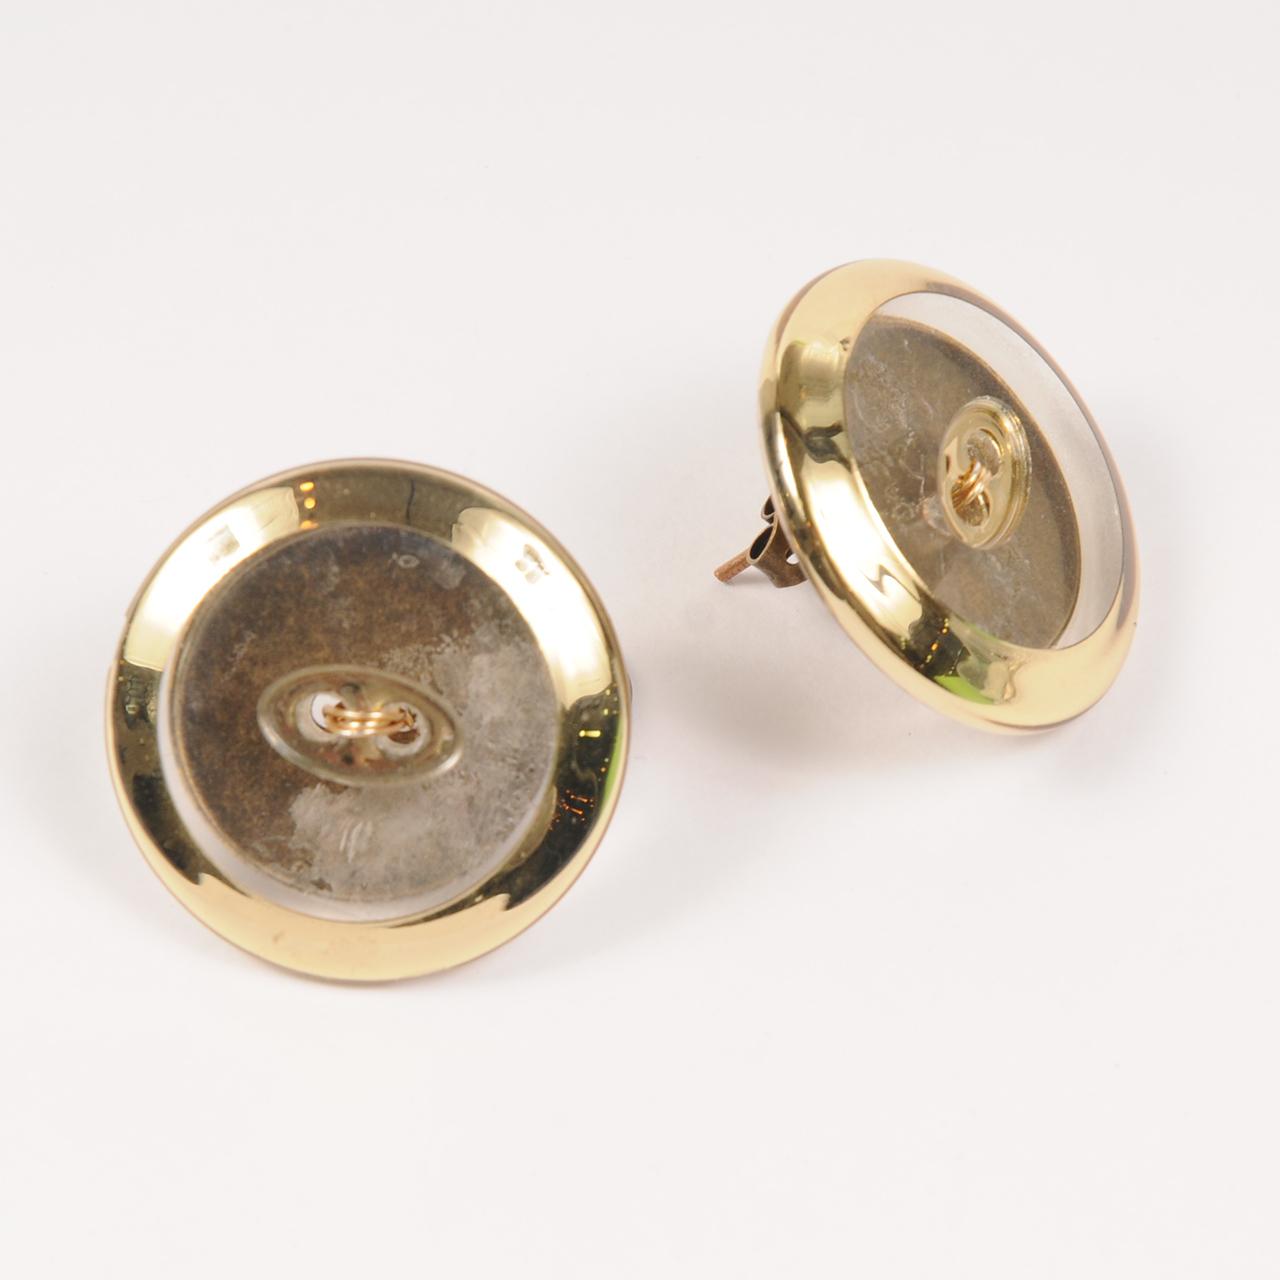 df20SS-J01 VINTAGE BOTTON PIERCE - gold